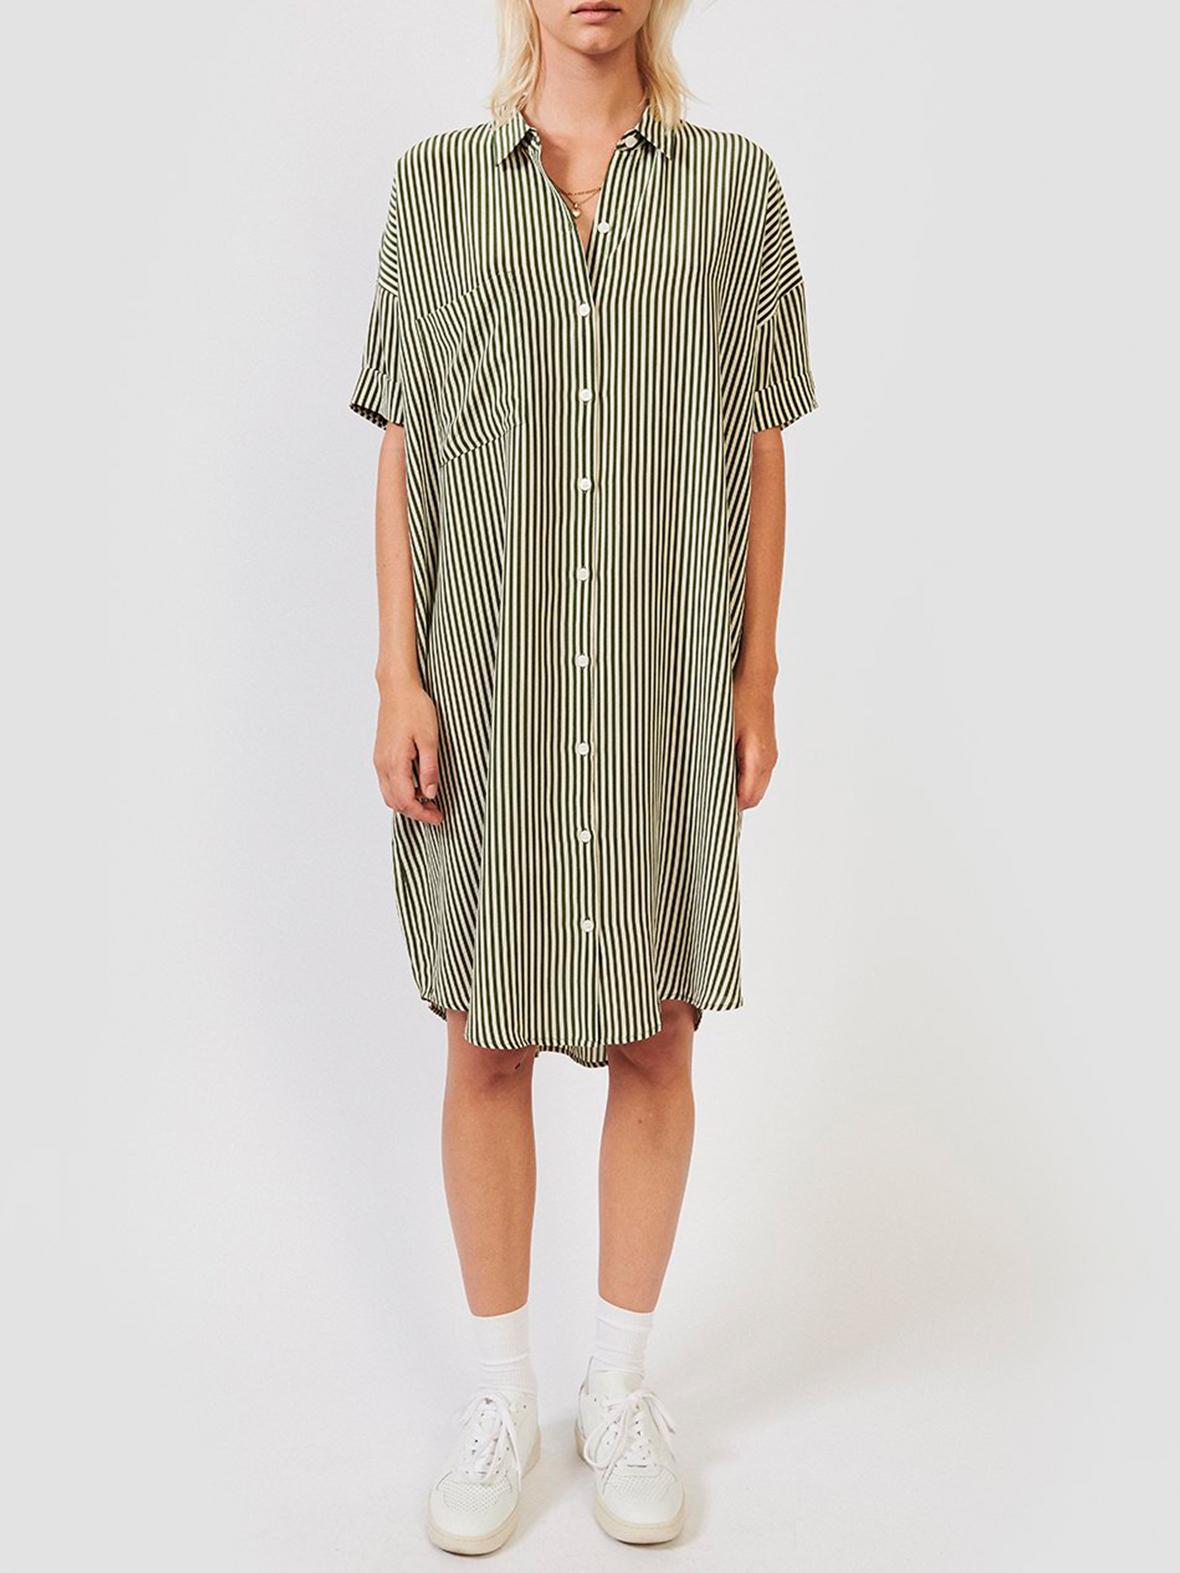 5372f0ea6b4f Enula9 - Gravid kjoler - Kokoon - Daisy shirt dress - Moss Green Stripe